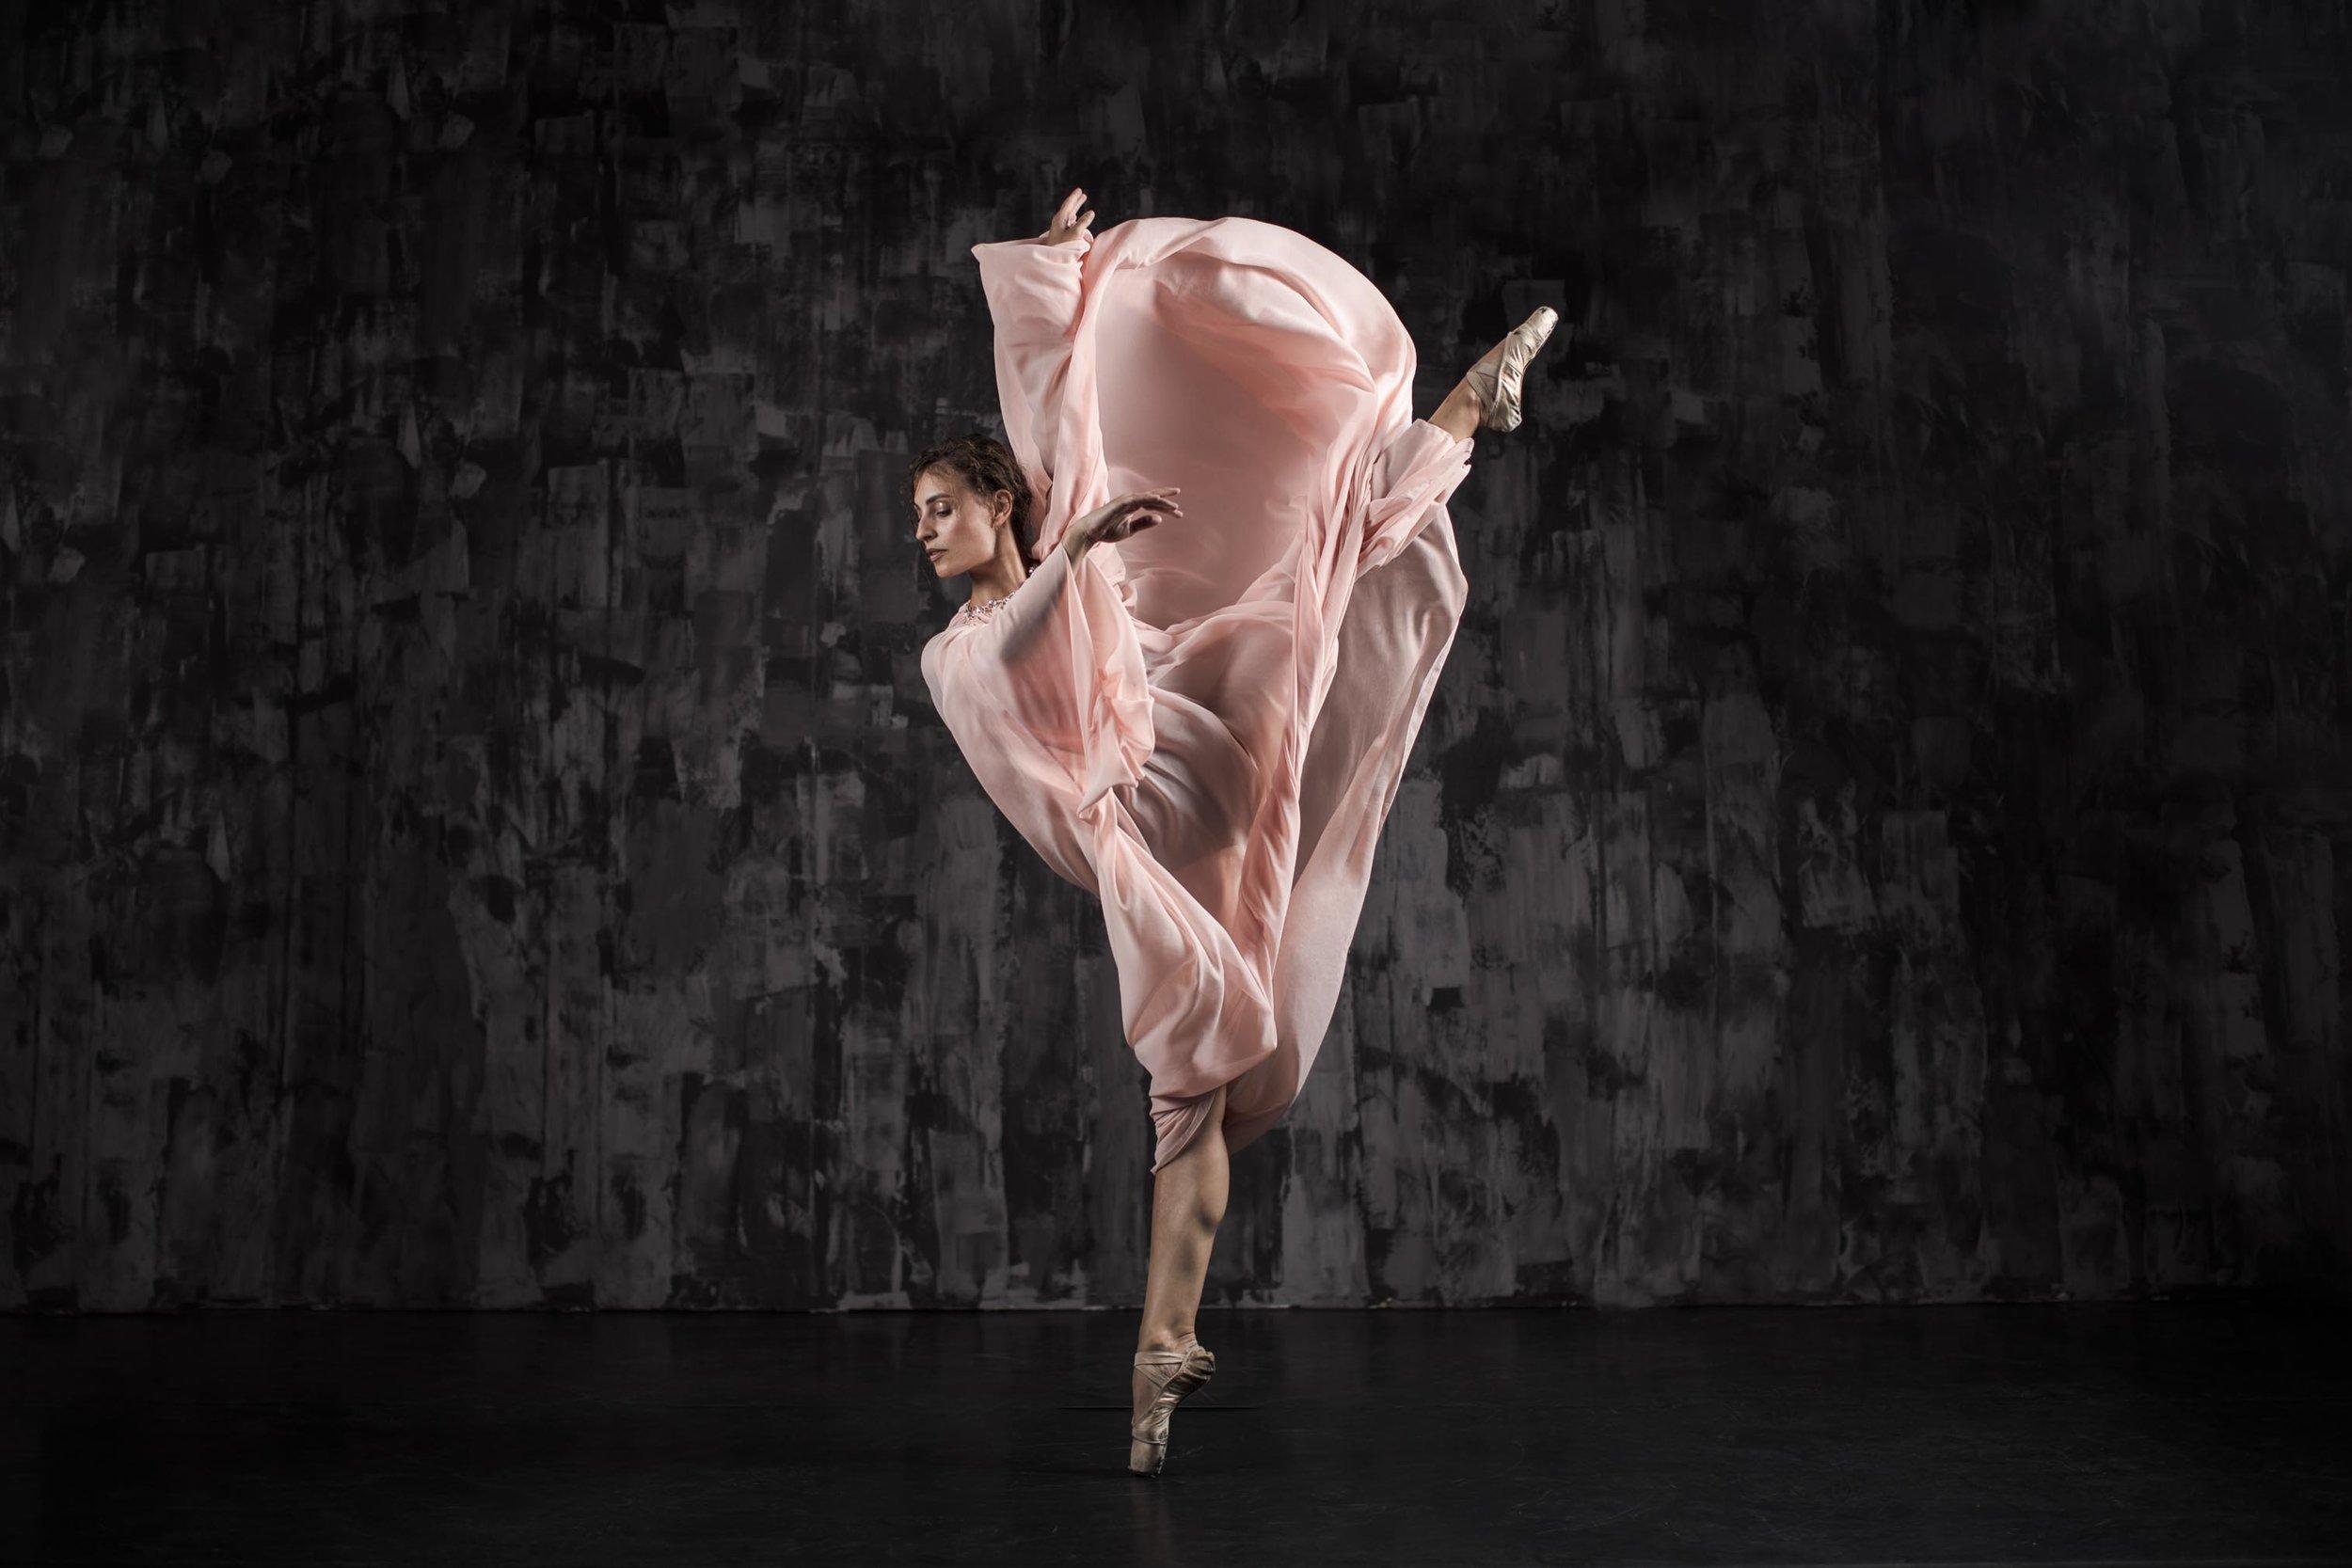 danseuse-ballet-seance-photo-studio.jpg